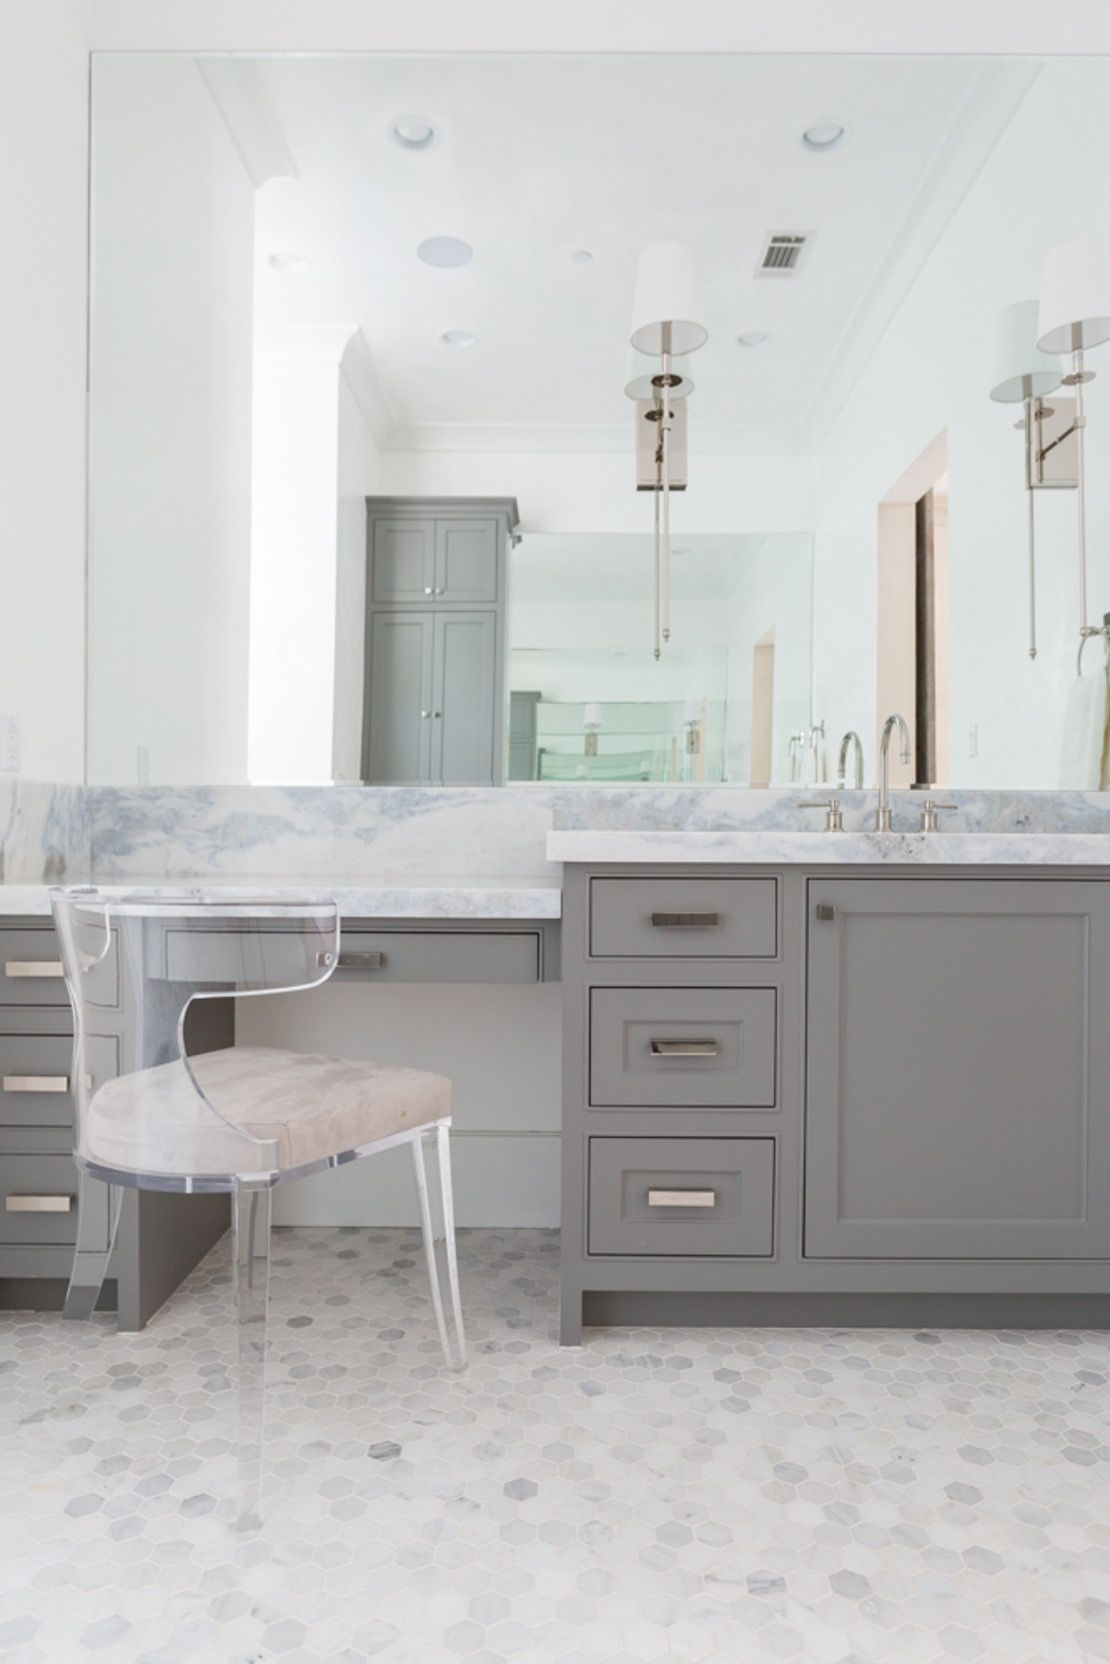 Bathroom Vanity Chair bathroom vanity w lucite chair bath contemporarytalbot cooley